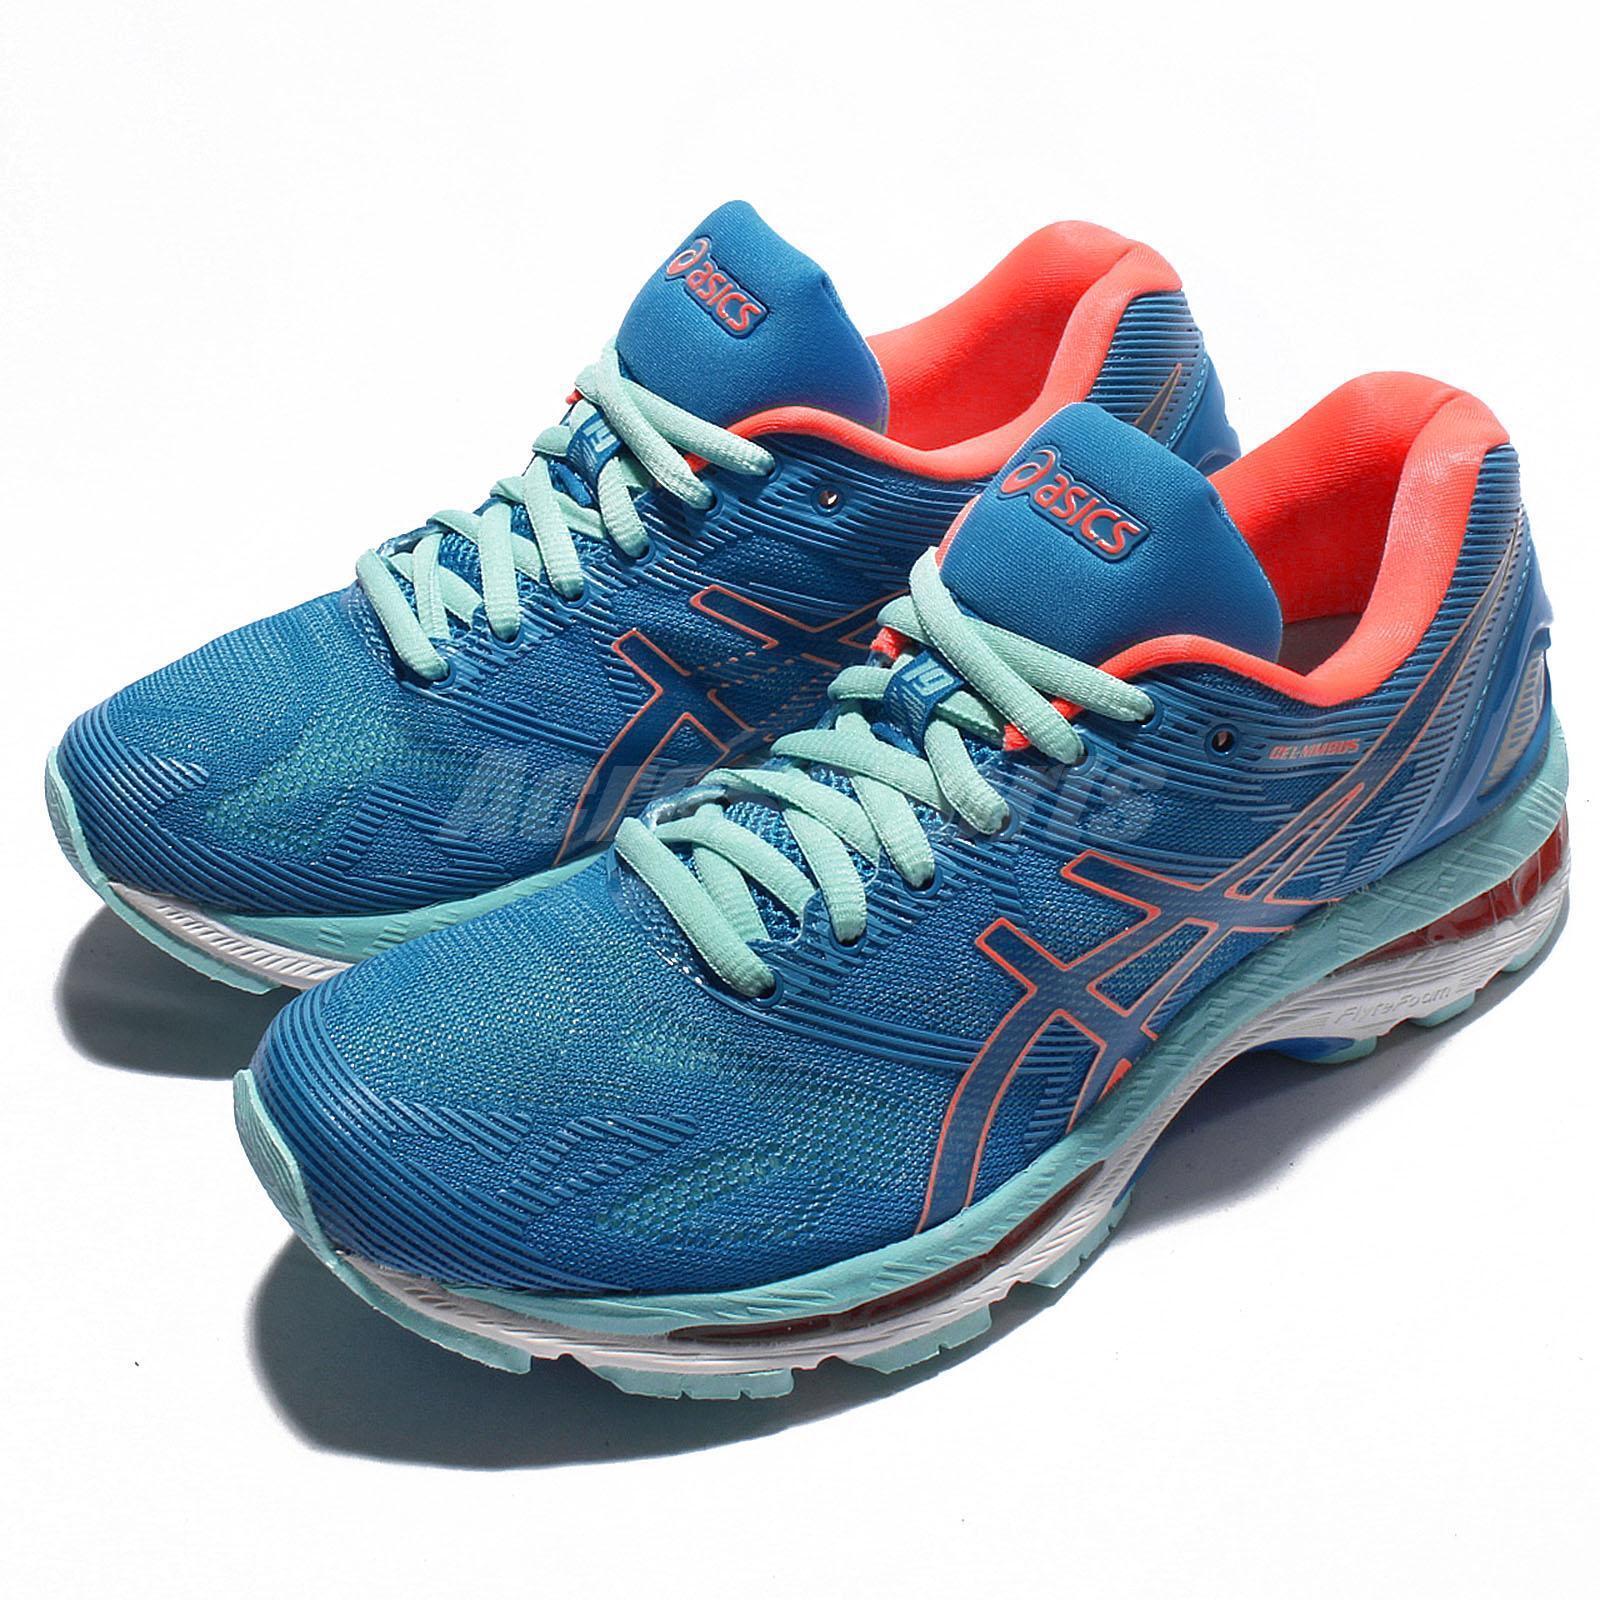 Asics Gel-Nimbus 19 bluee Green orange Women Running shoes Sneakers T750N-4306